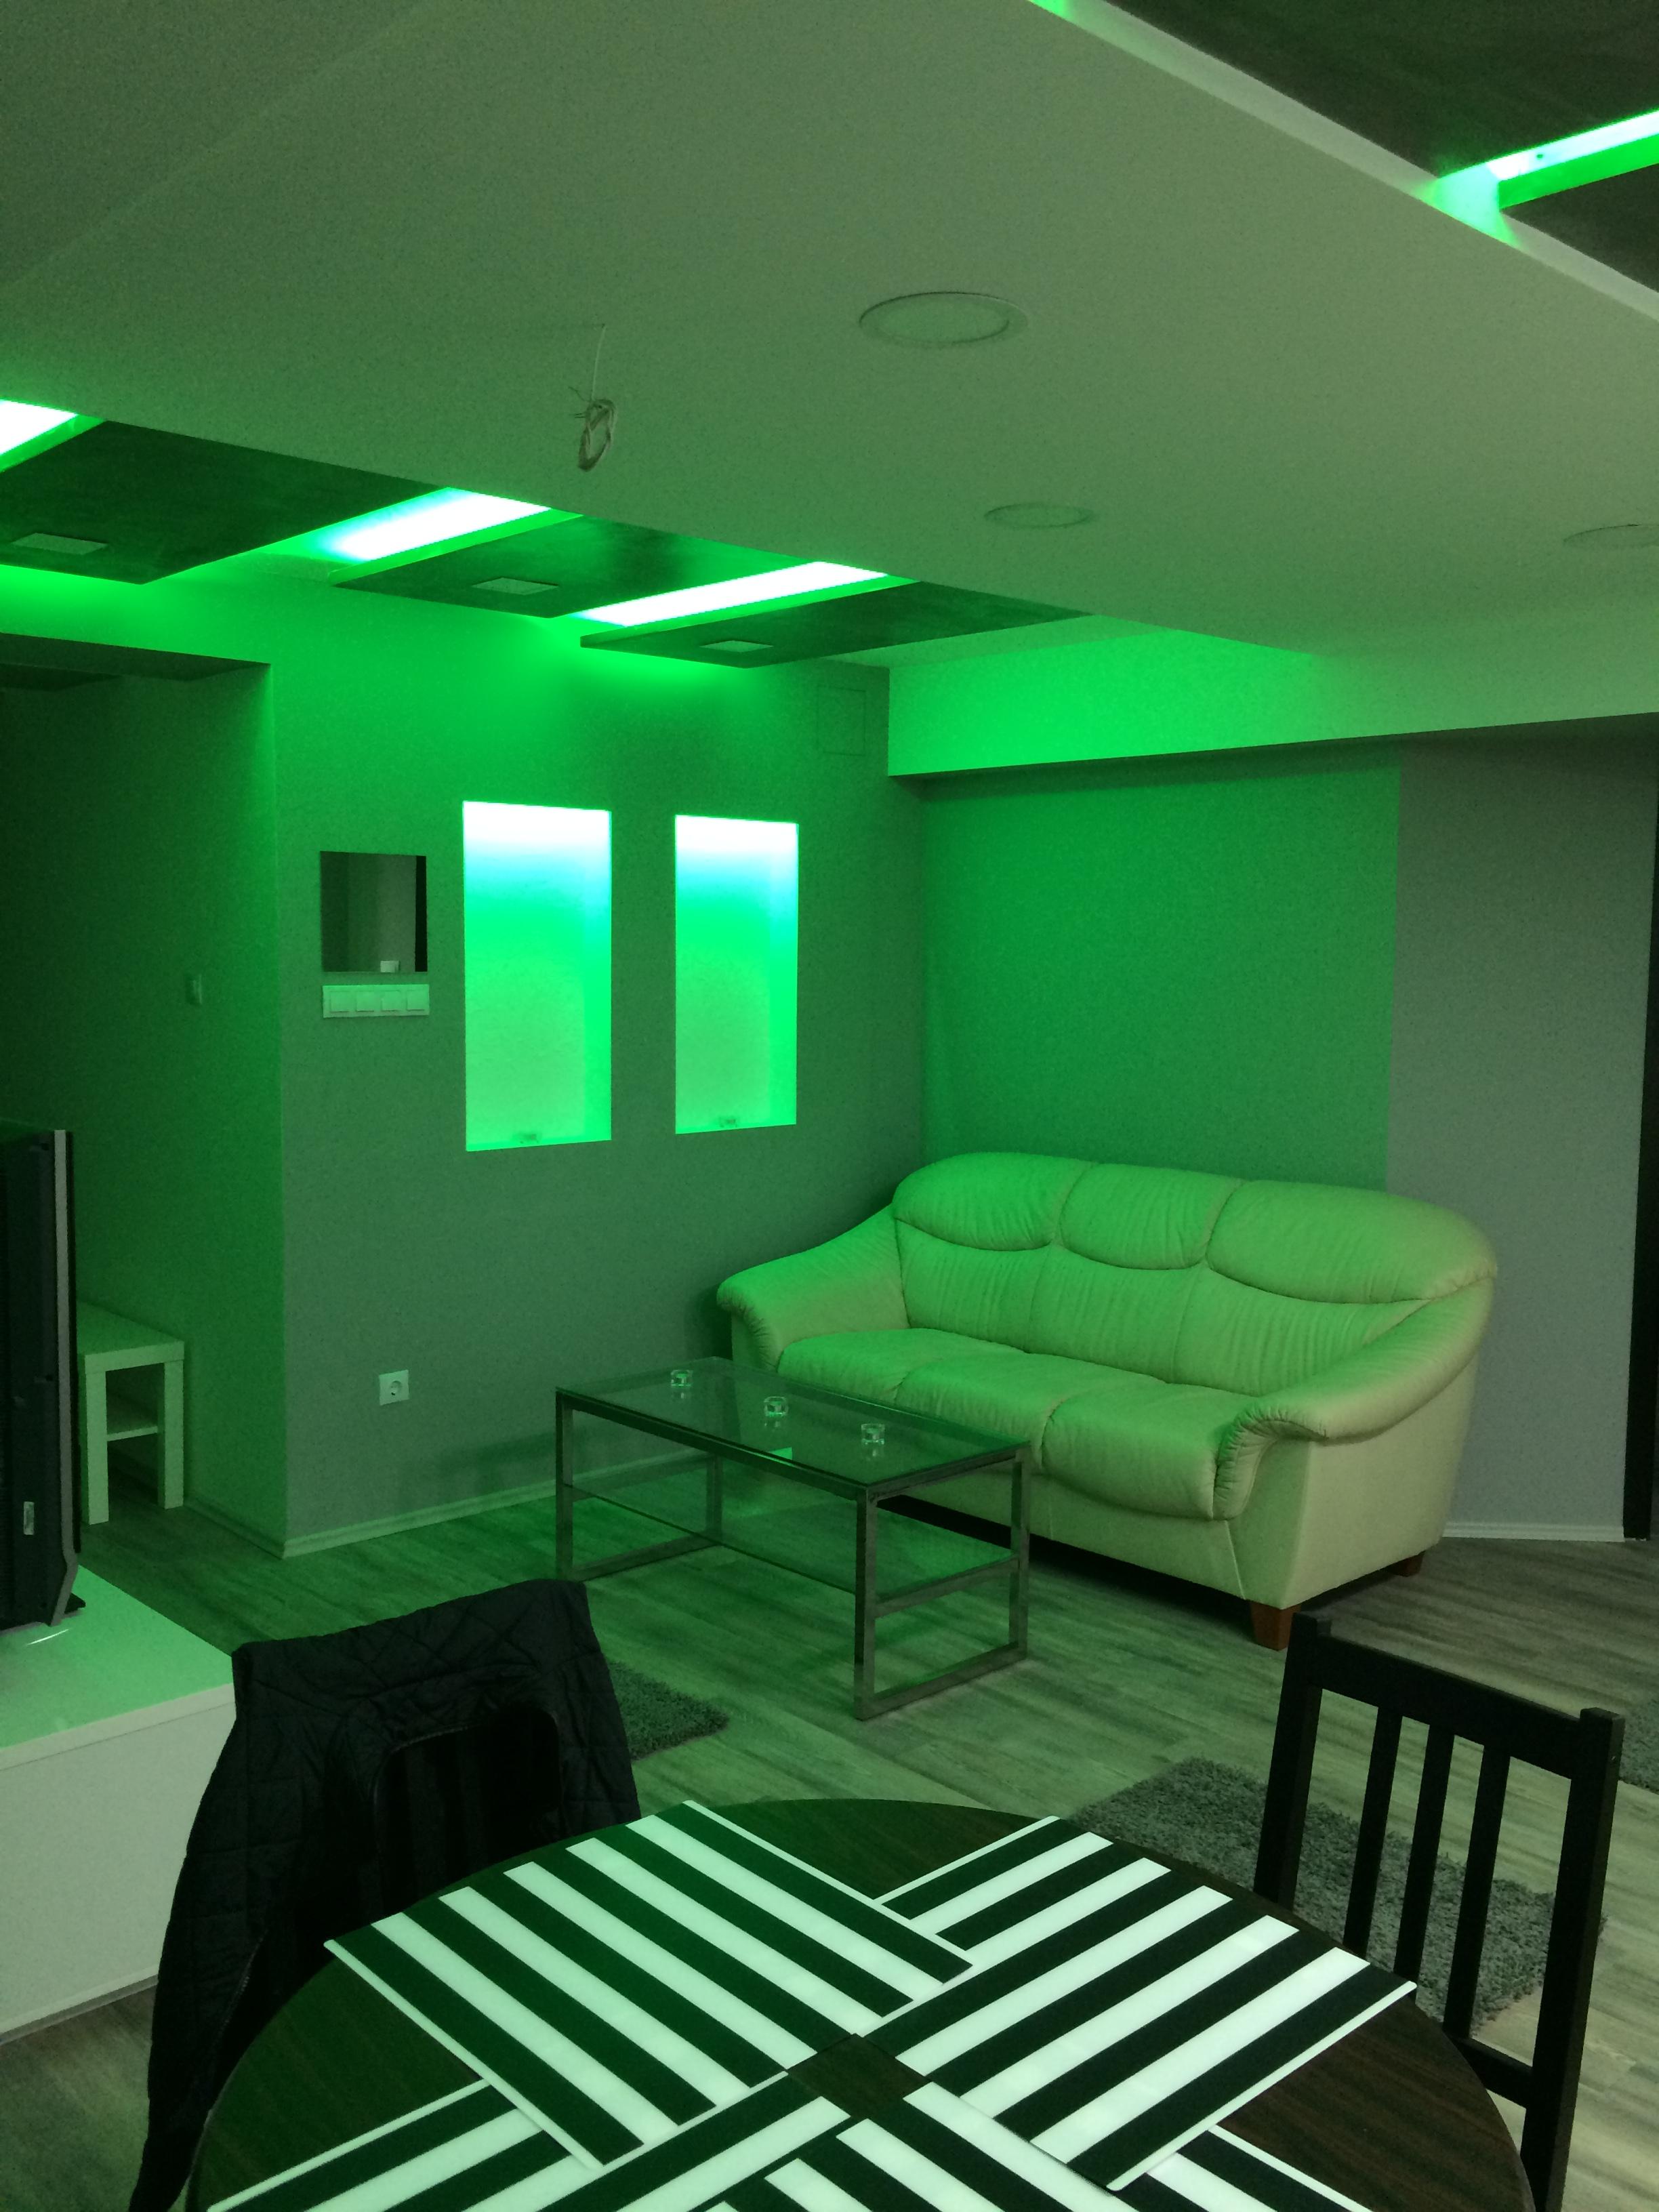 LED, PROFI-L Studio Dekor.JPG